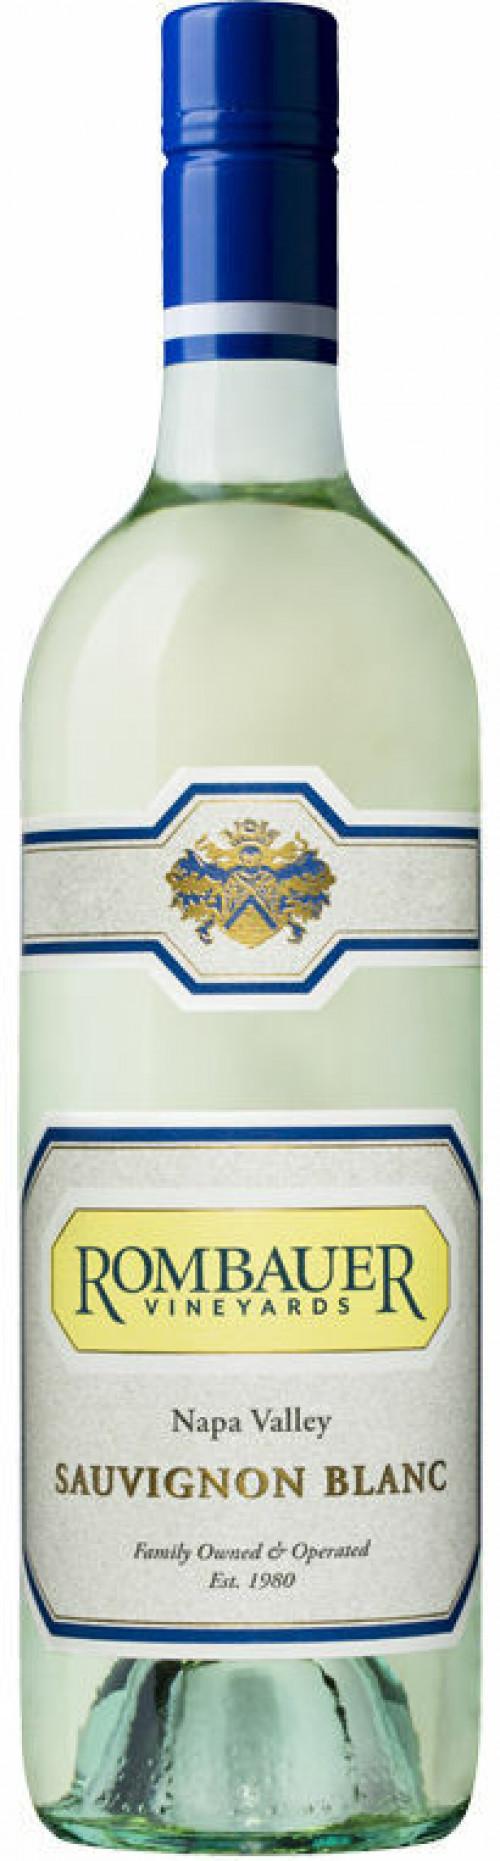 2020 Rombauer Napa Sauvignon Blanc 750ml